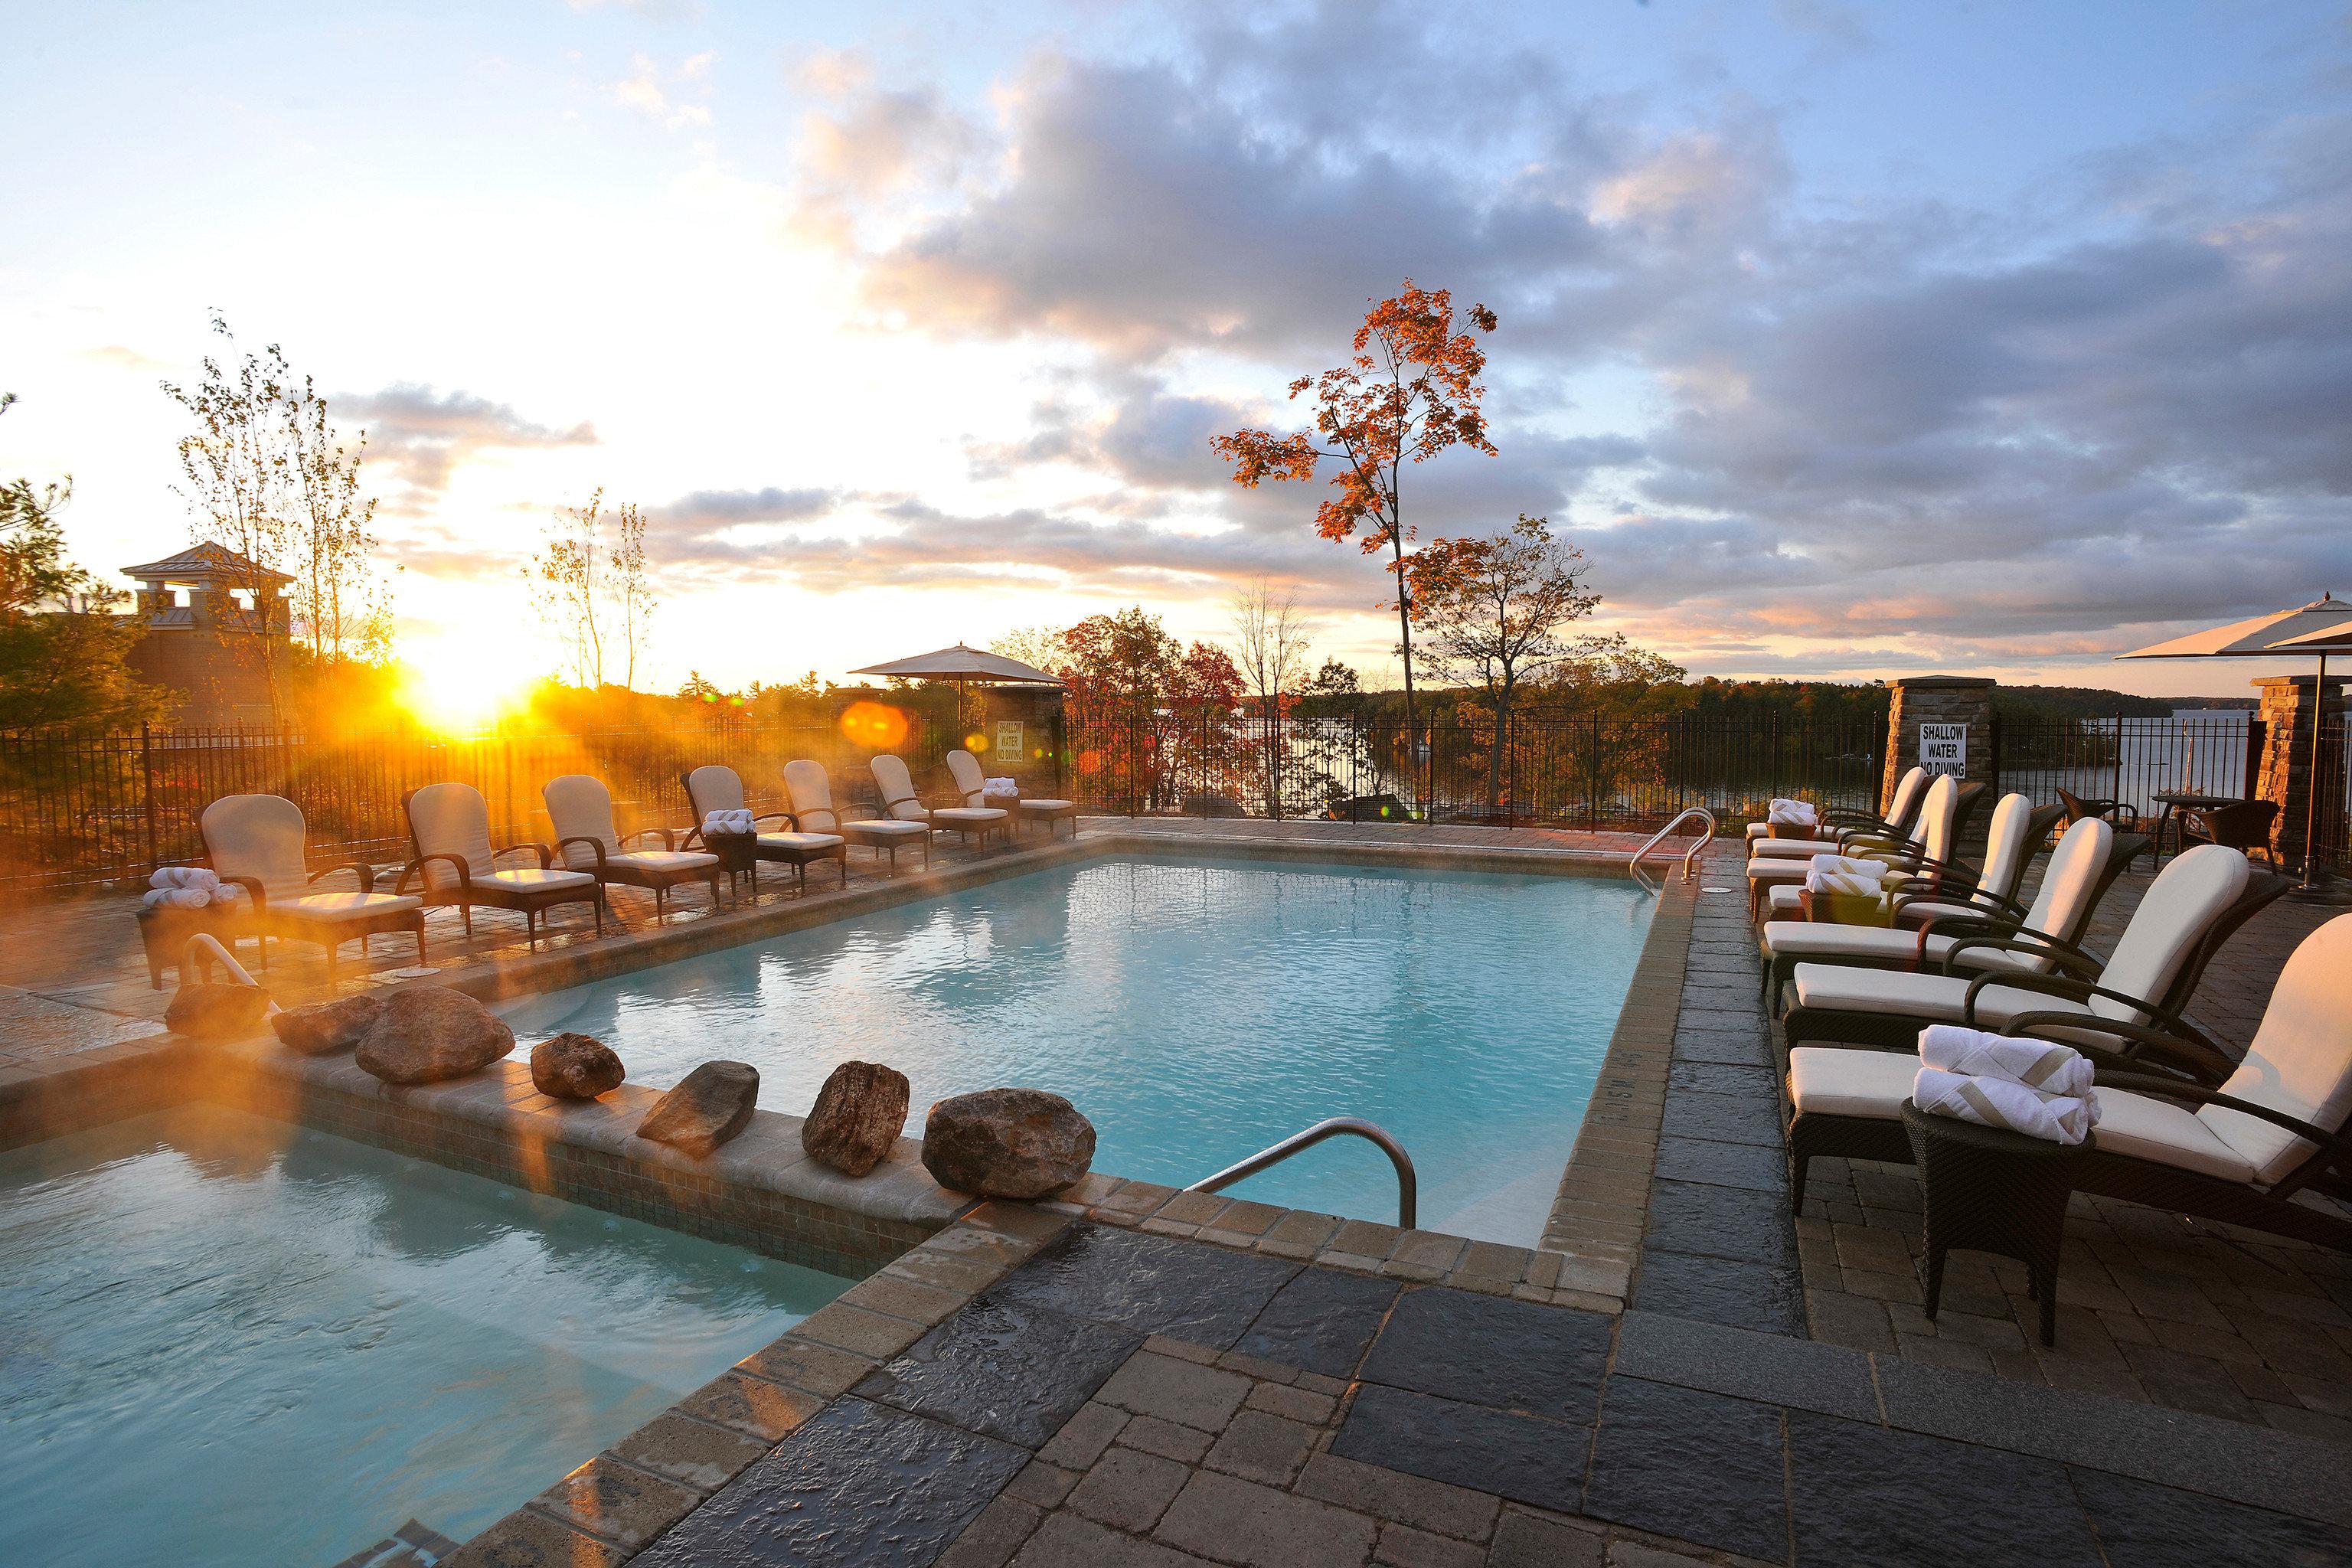 Hot tub Outdoors Play Pool Resort Scenic views sky leisure swimming pool